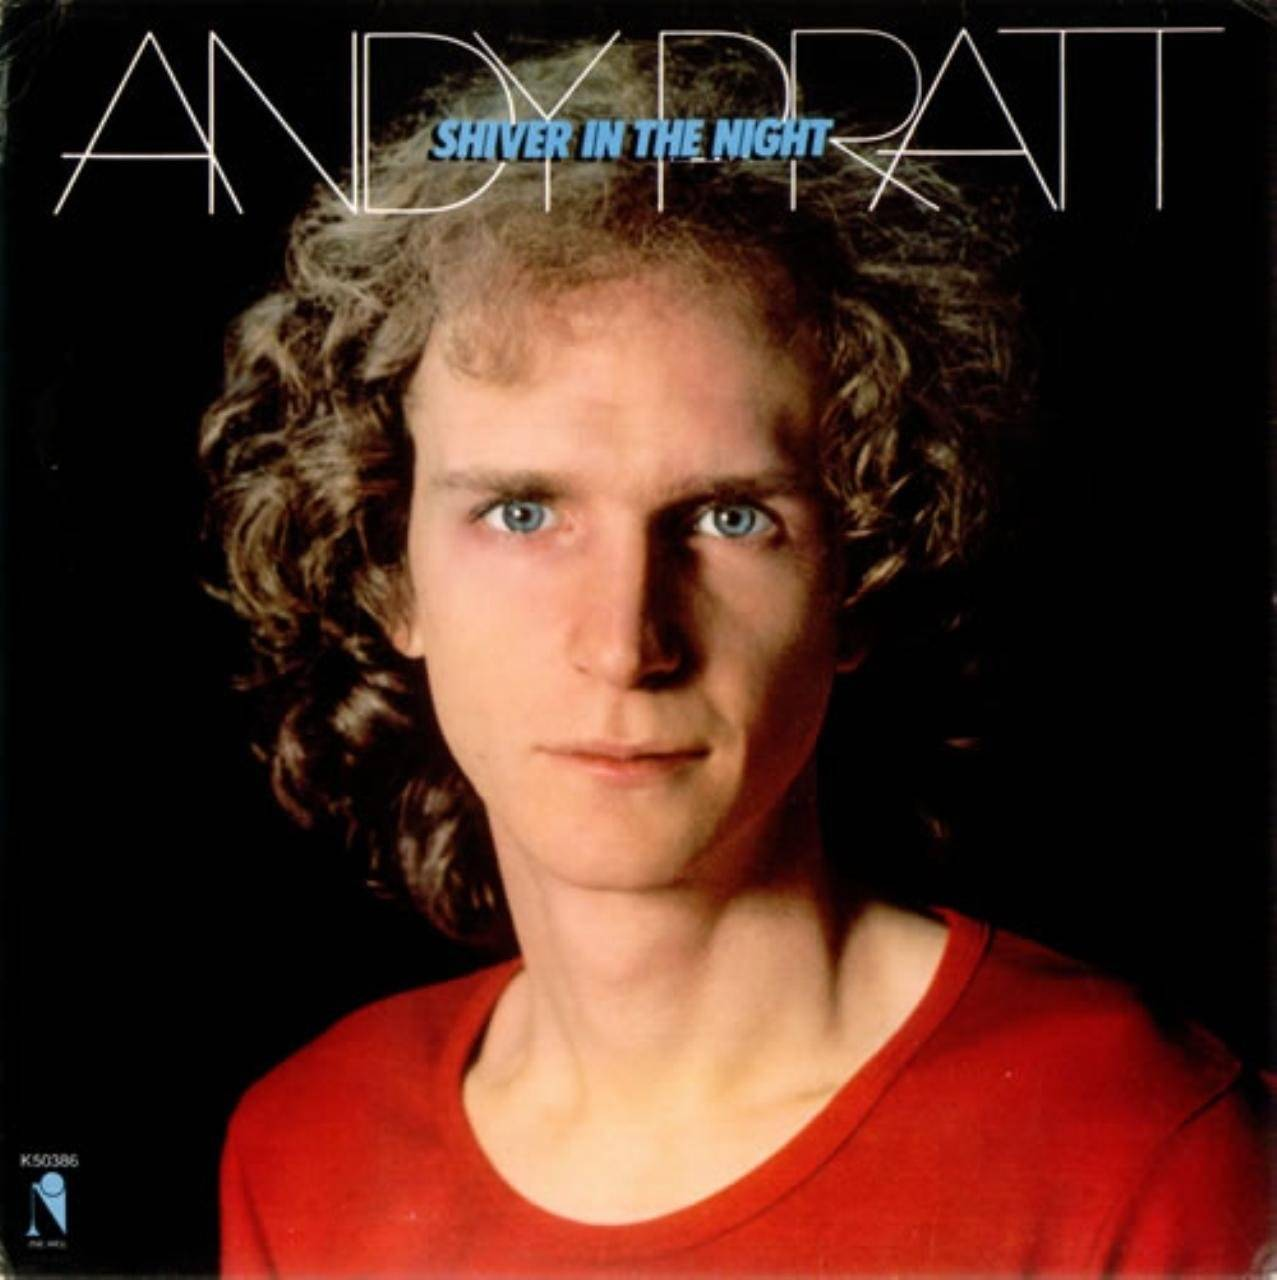 Andy Pratt - Shiver in the Night Mini LP CD